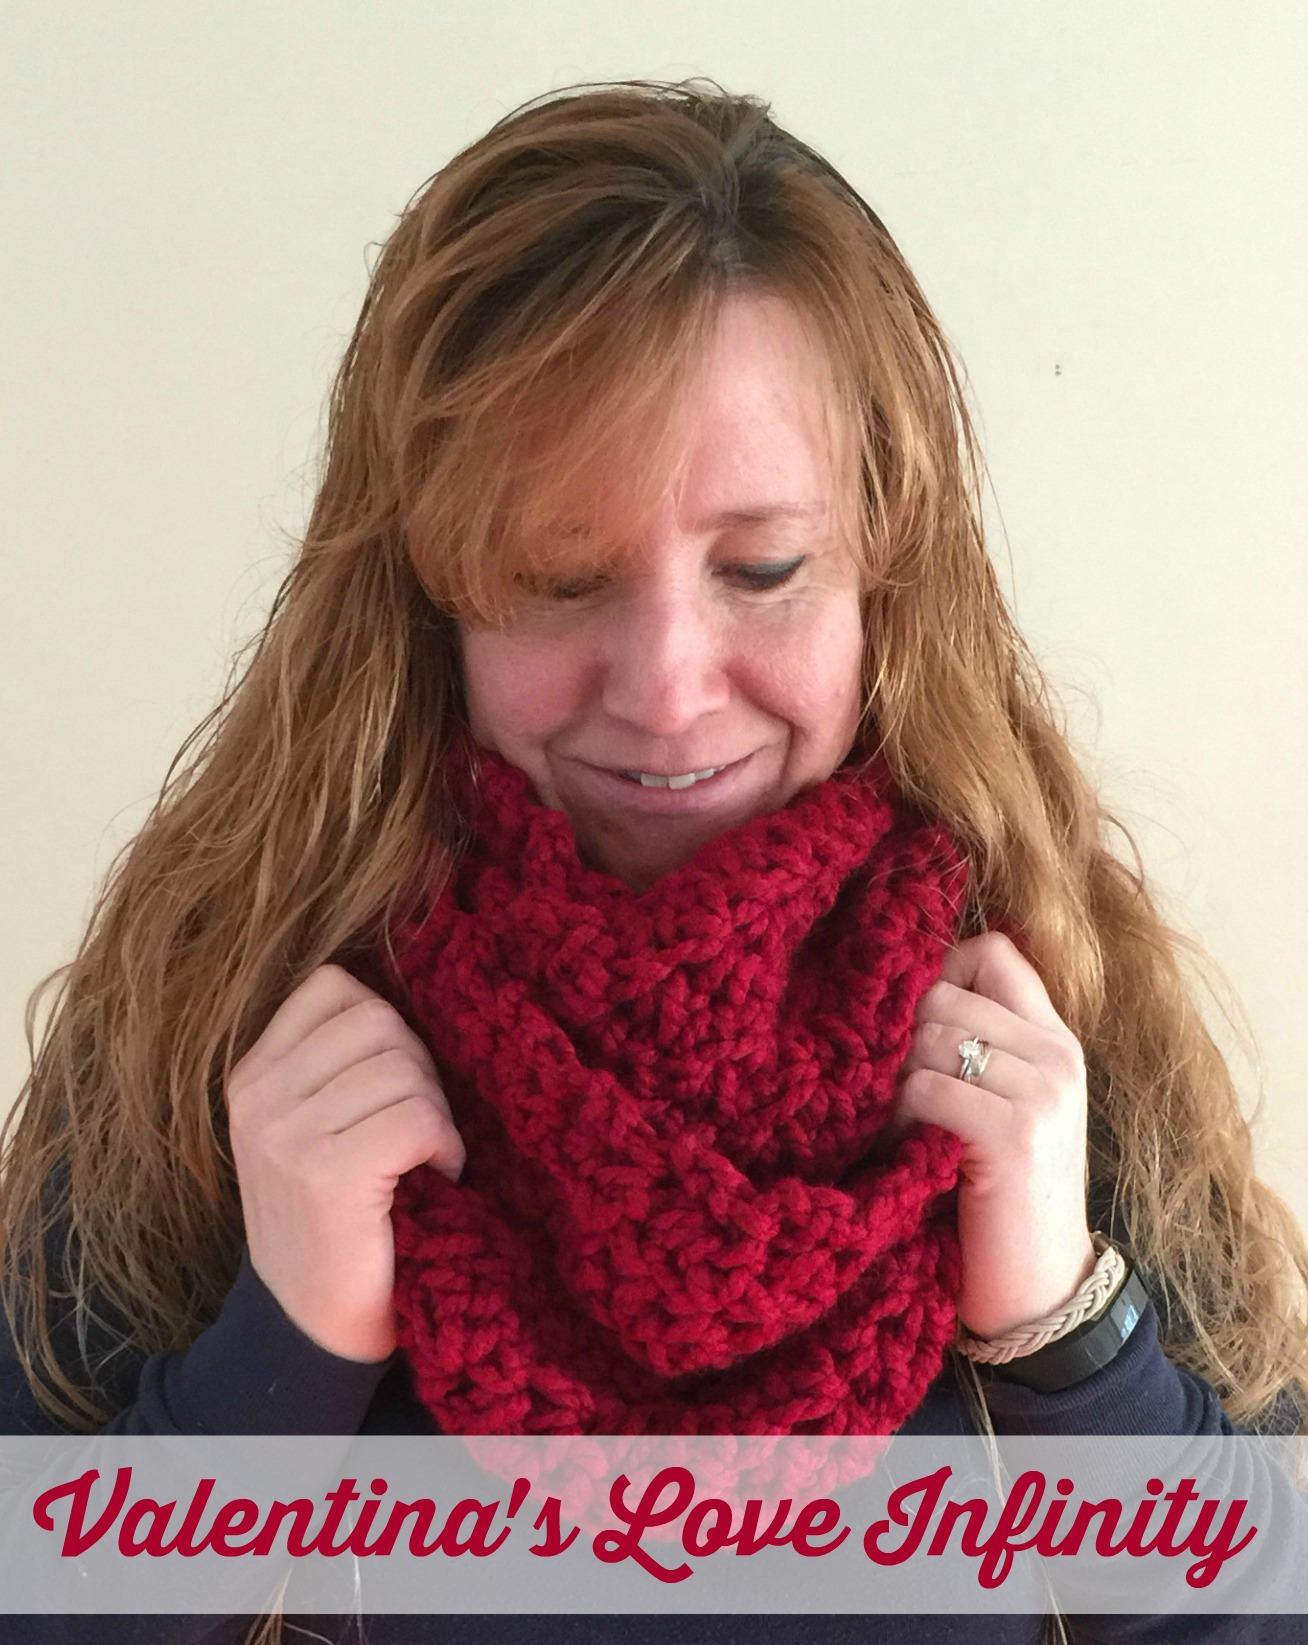 Free Infinity crochet pattern by Ambassador Crochet - Valentina's Love Infinity & cowl.